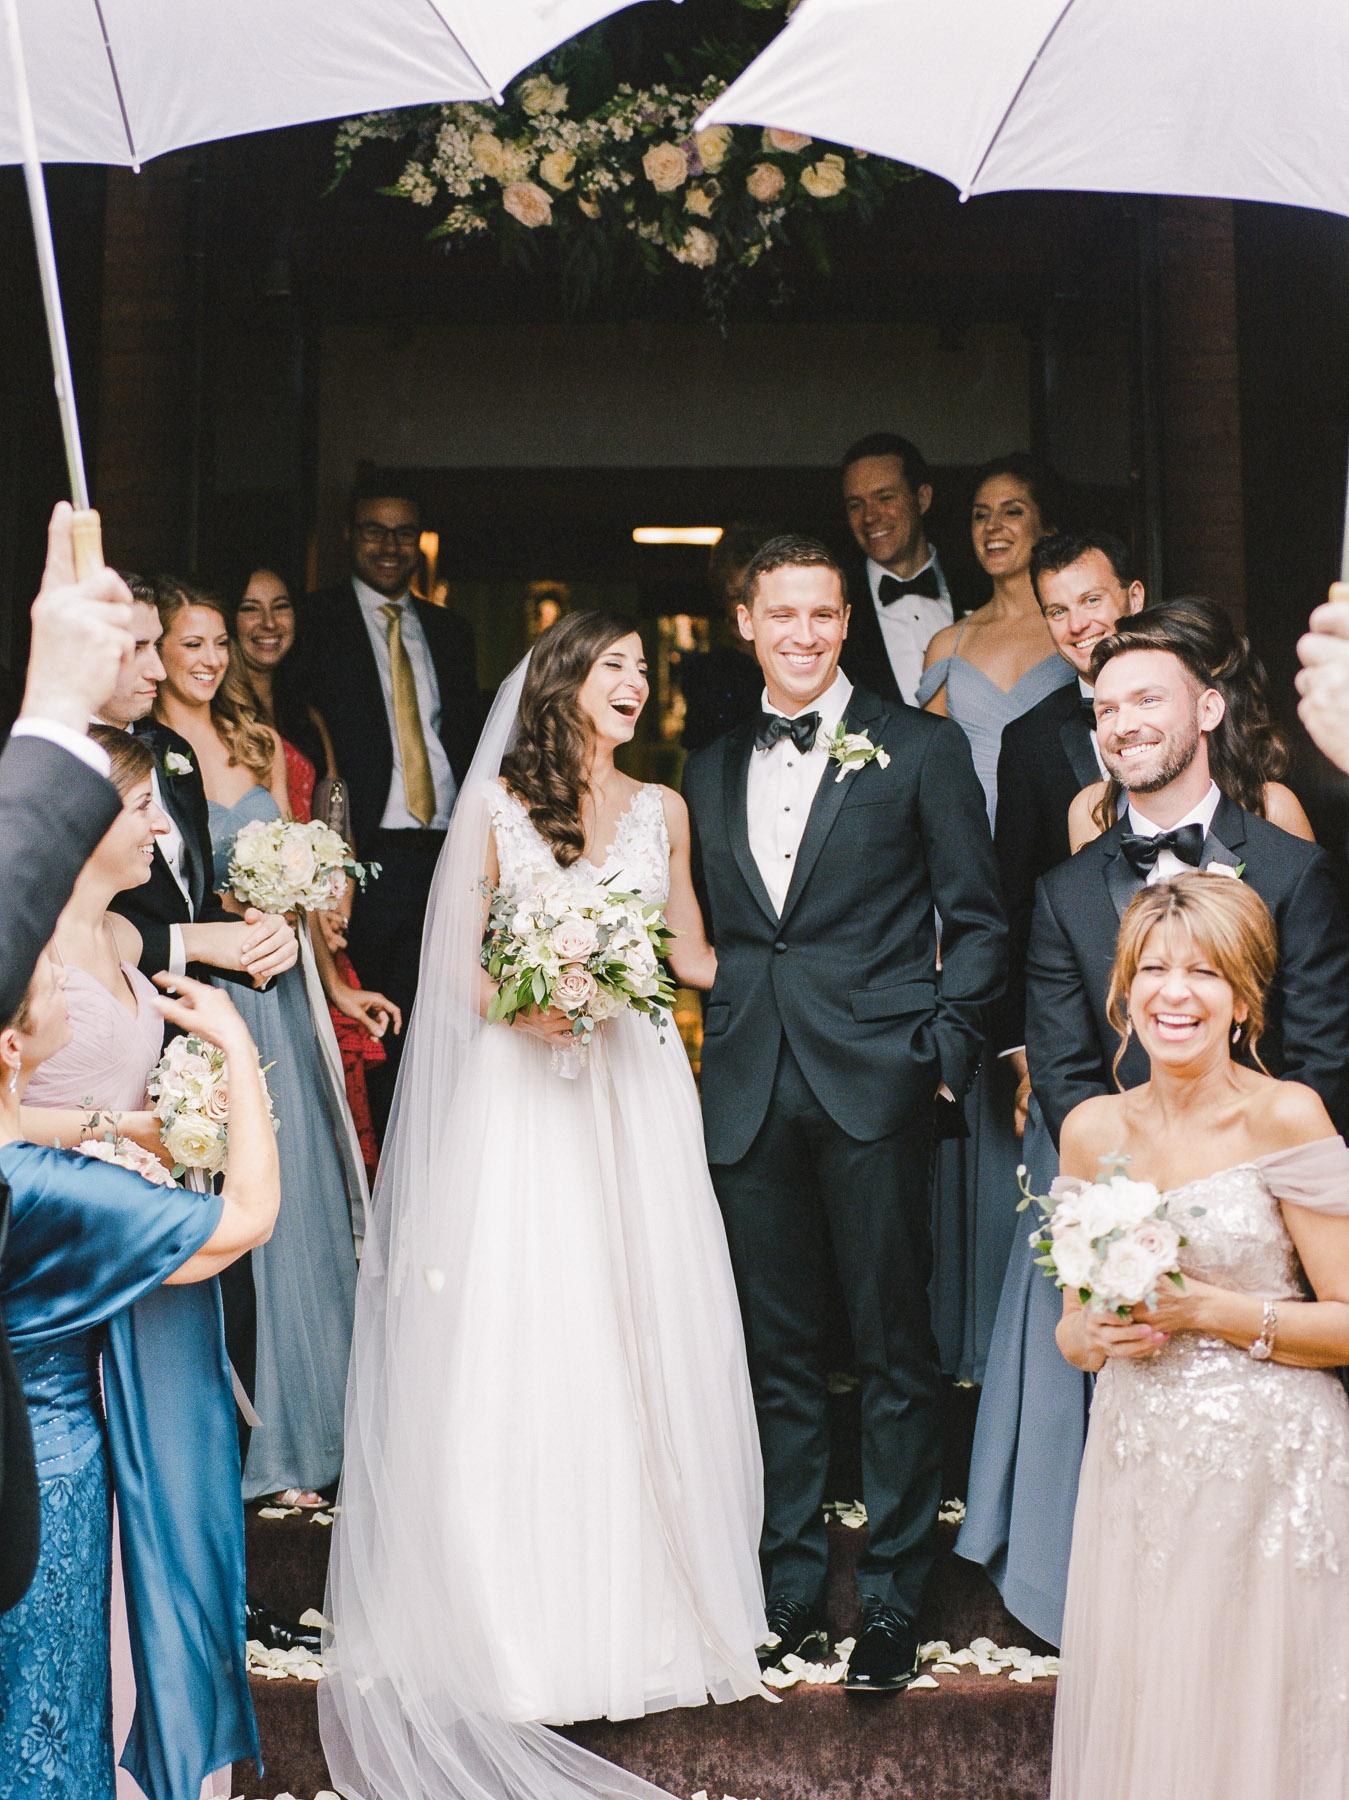 Exit of Church on Rainy Wedding Day